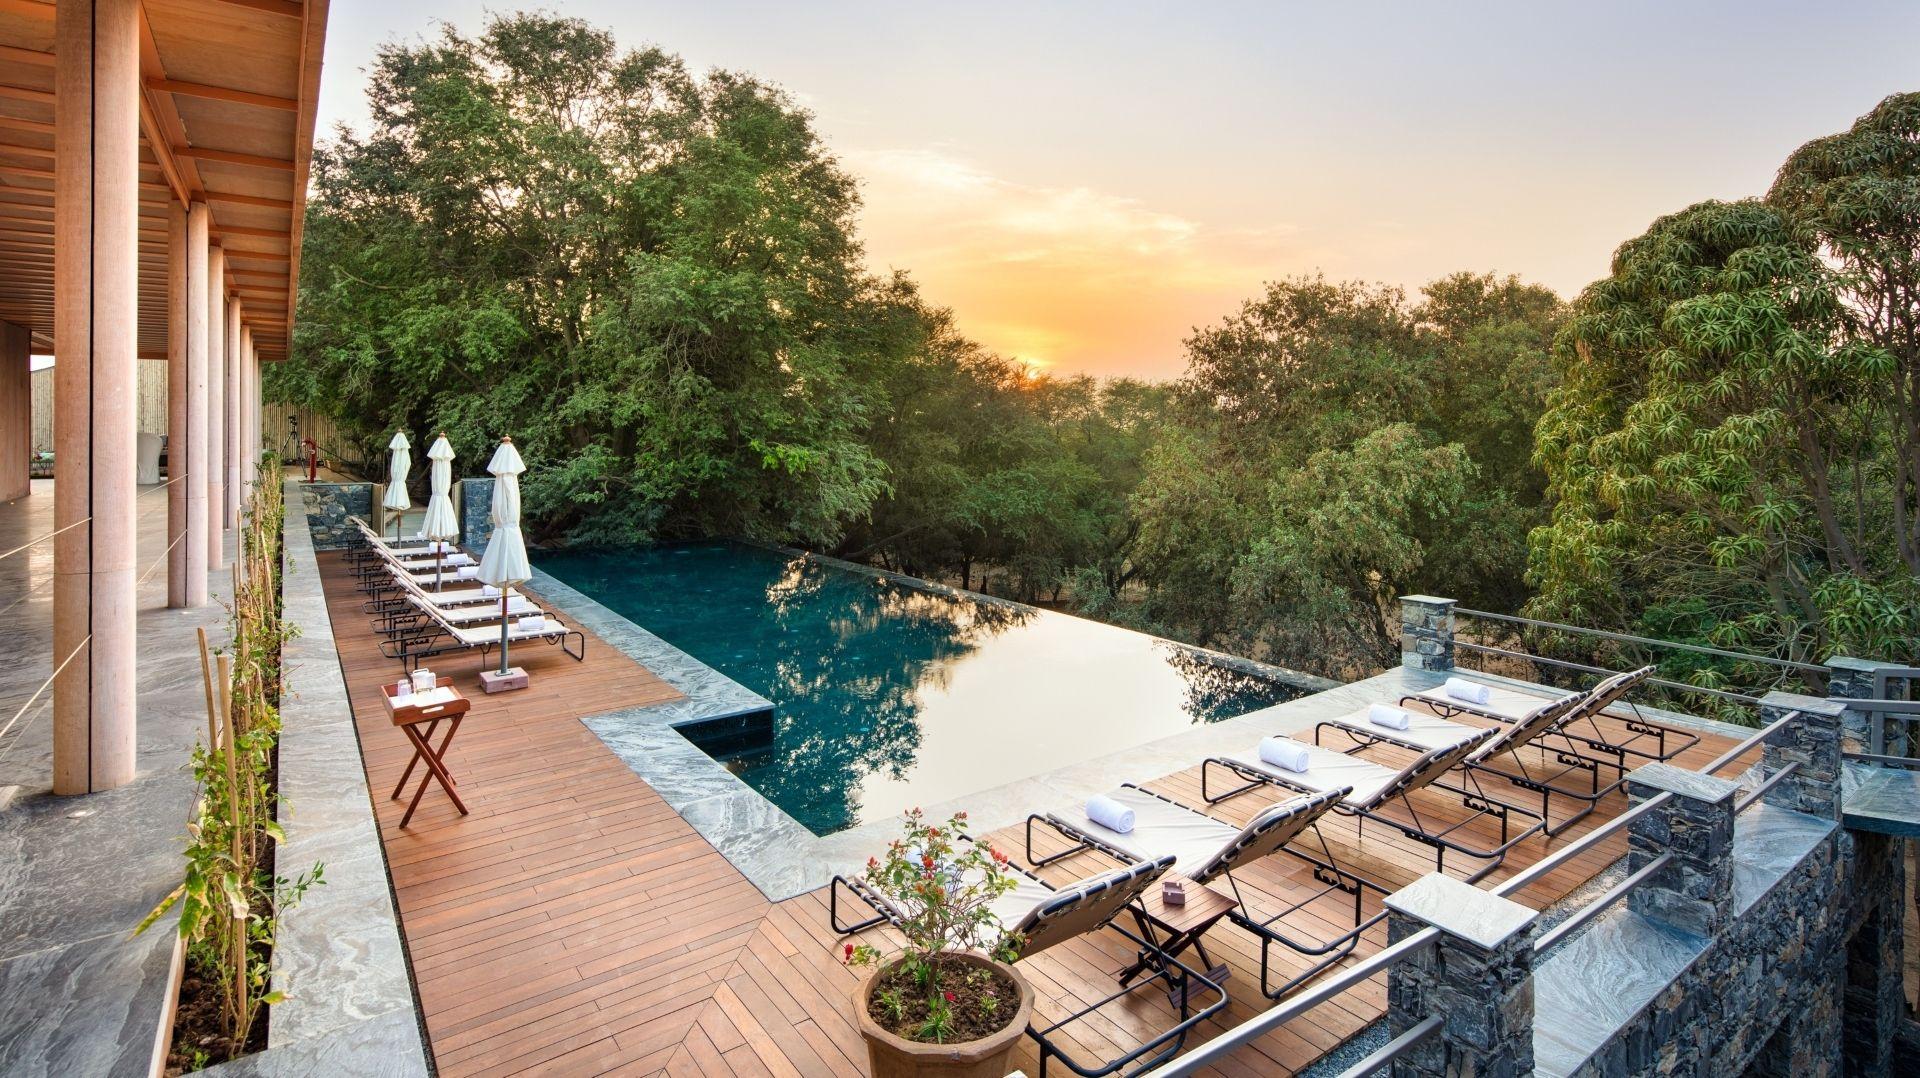 RAAS Chhatrasagar – The Pool